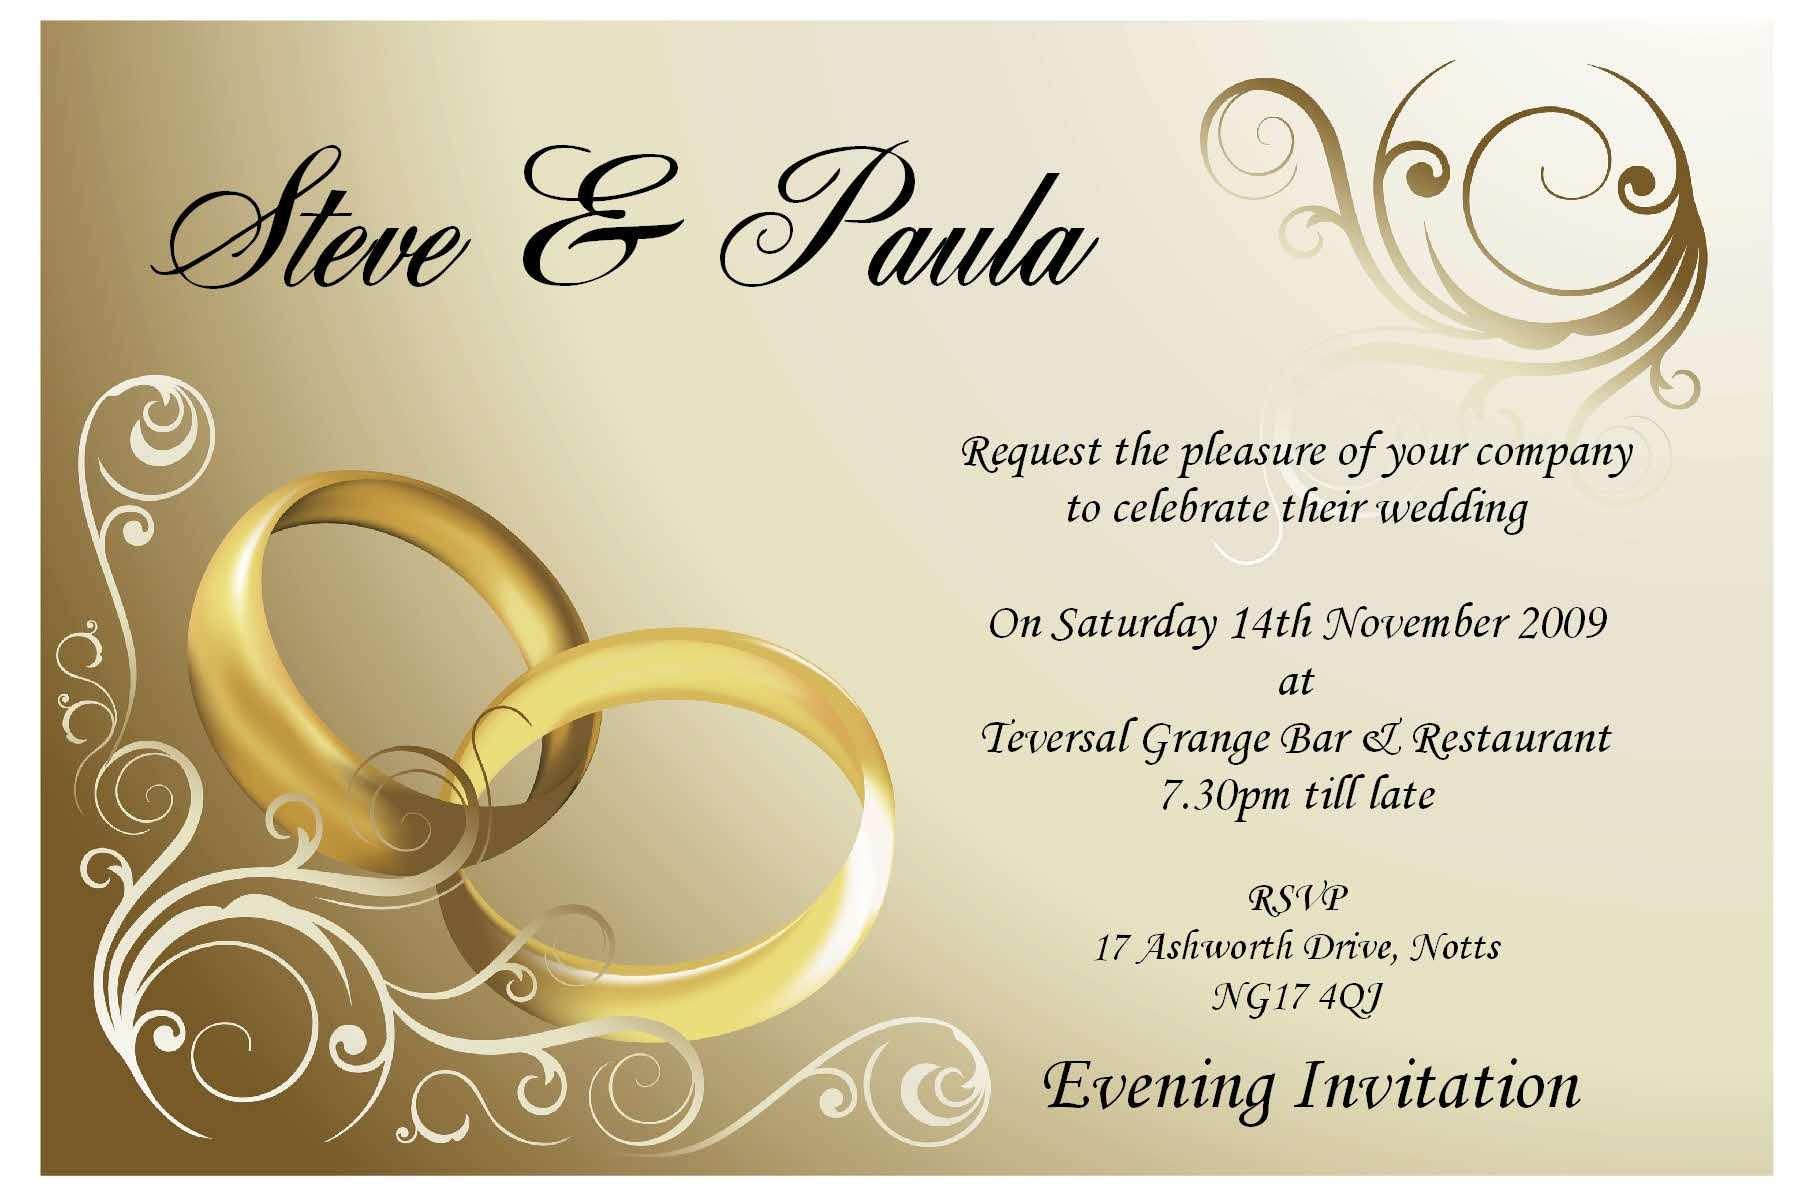 Indian Wedding Invitation Card Design Blank Template - Cards